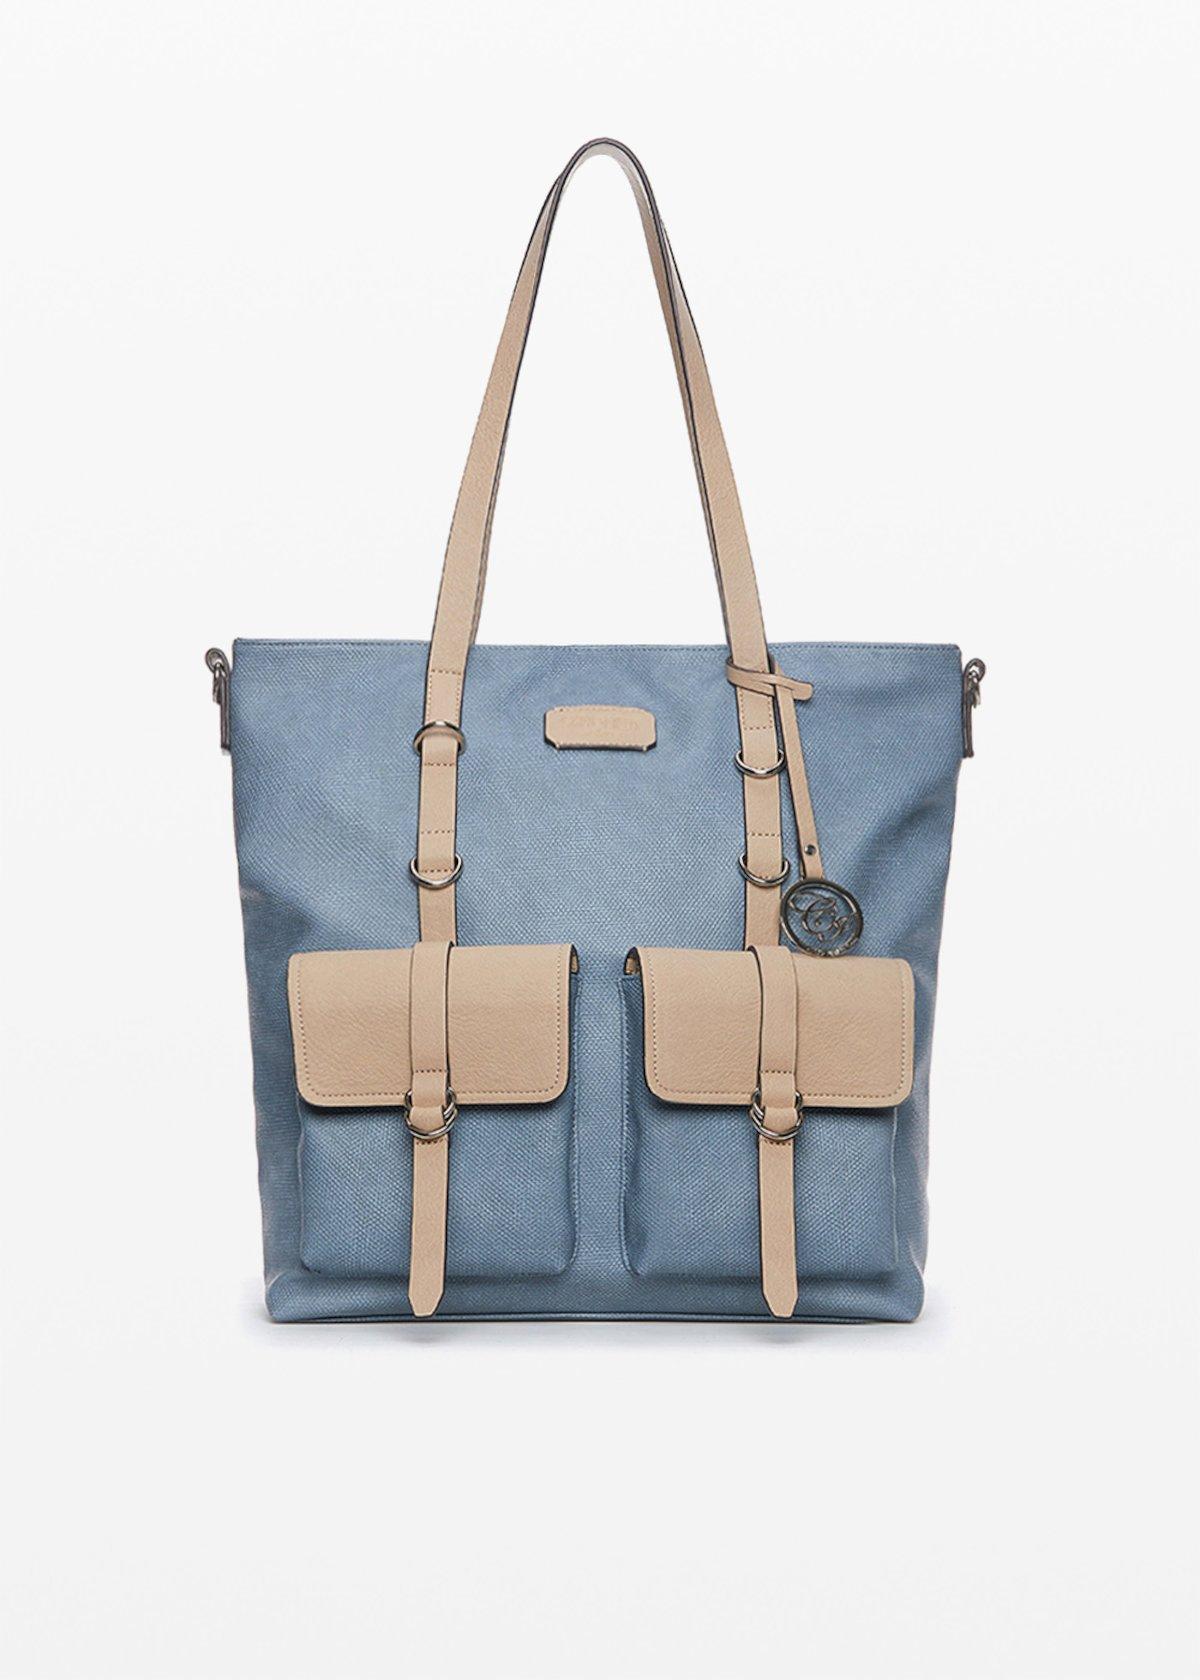 Bella faux leather bi-colour handbag with pockets - Shark / Doeskin - Woman